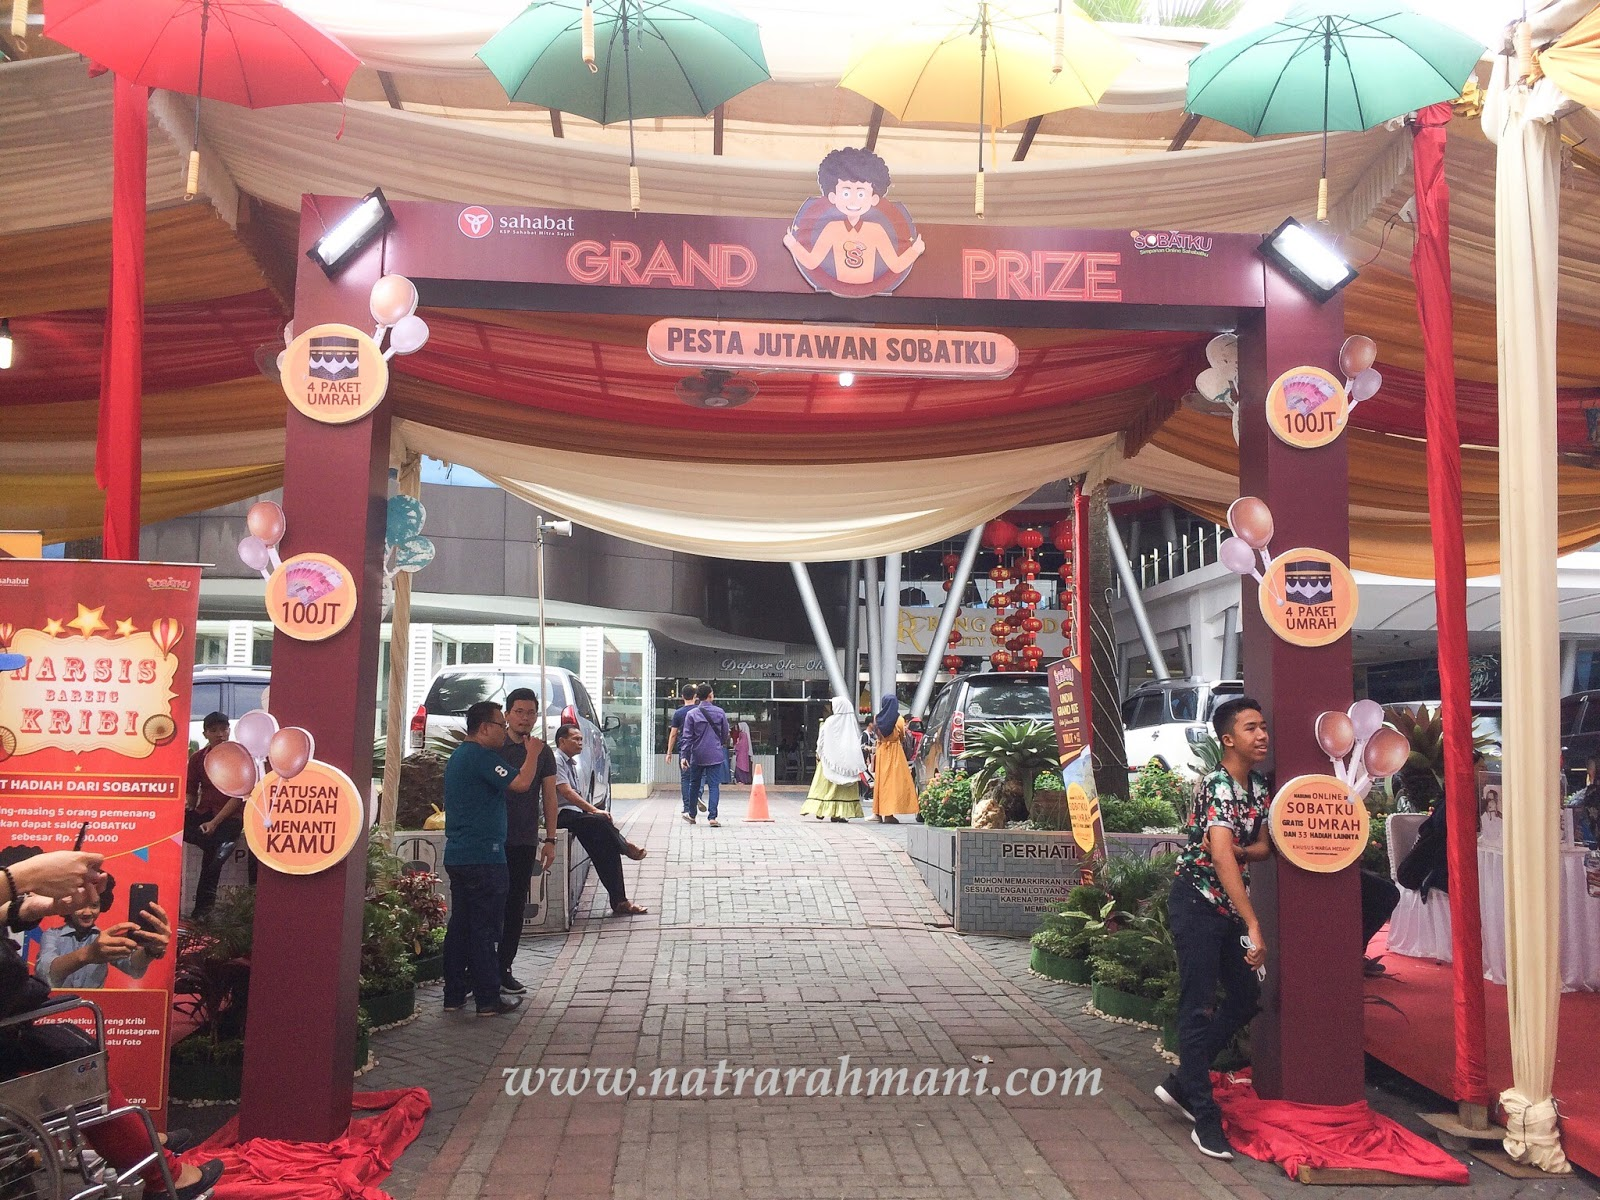 simpanan-online-sahabatku-undian-grand-prize-sobatku-medan-natrarahman